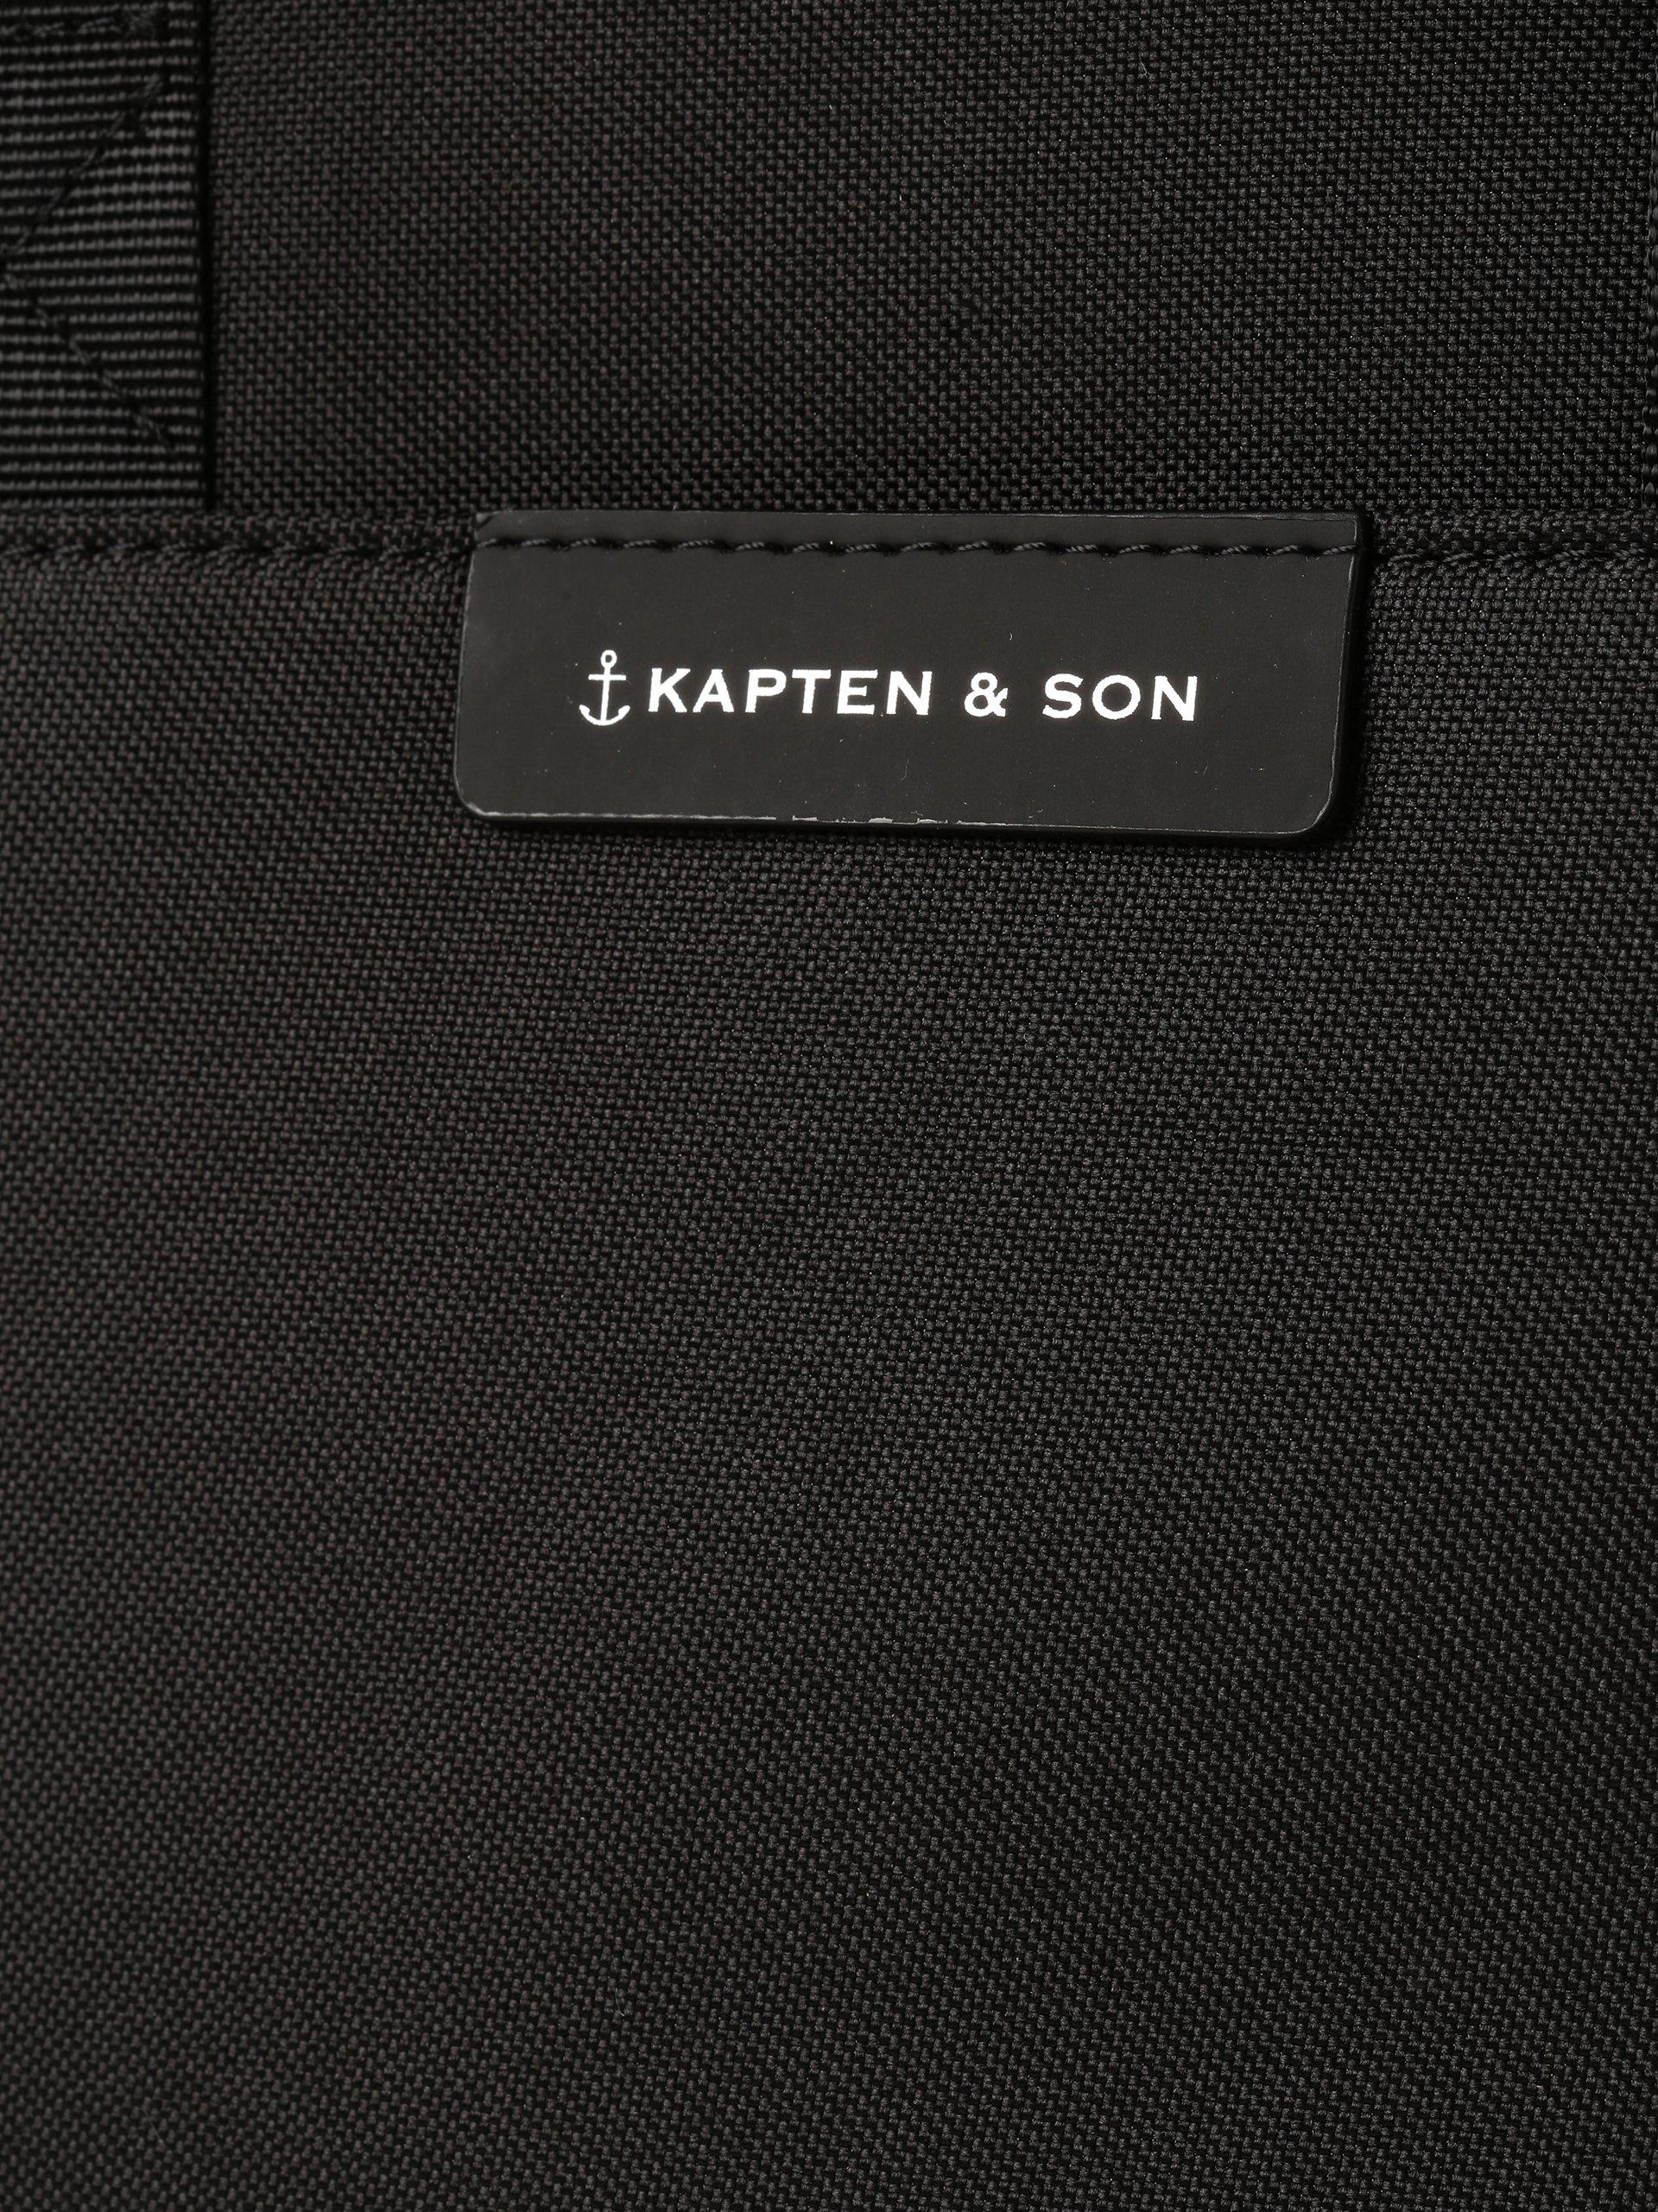 Kapten and Son Plecak damski – Malmö